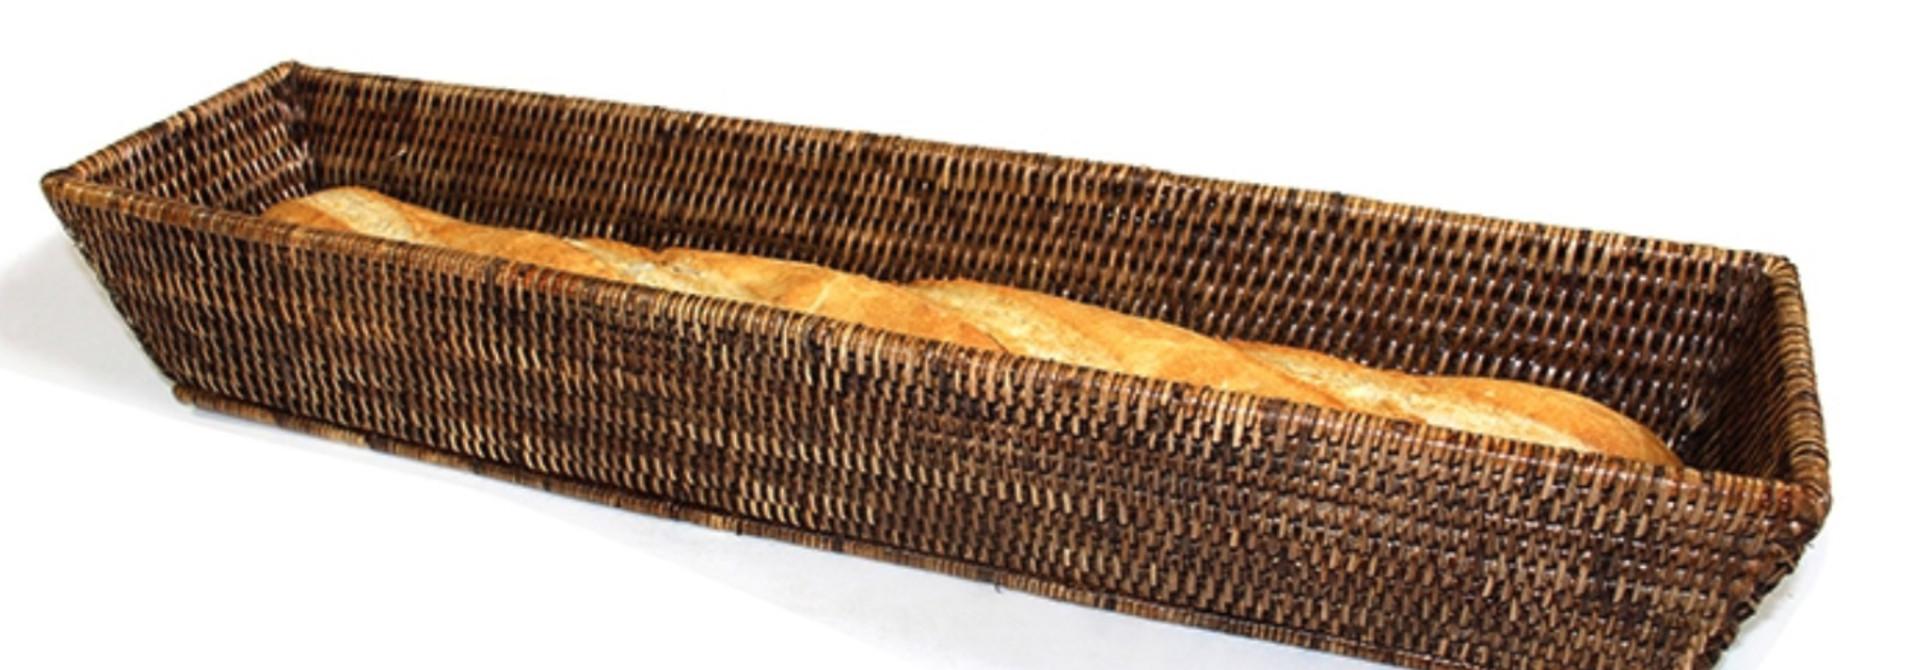 Rectangular French Bread Basket